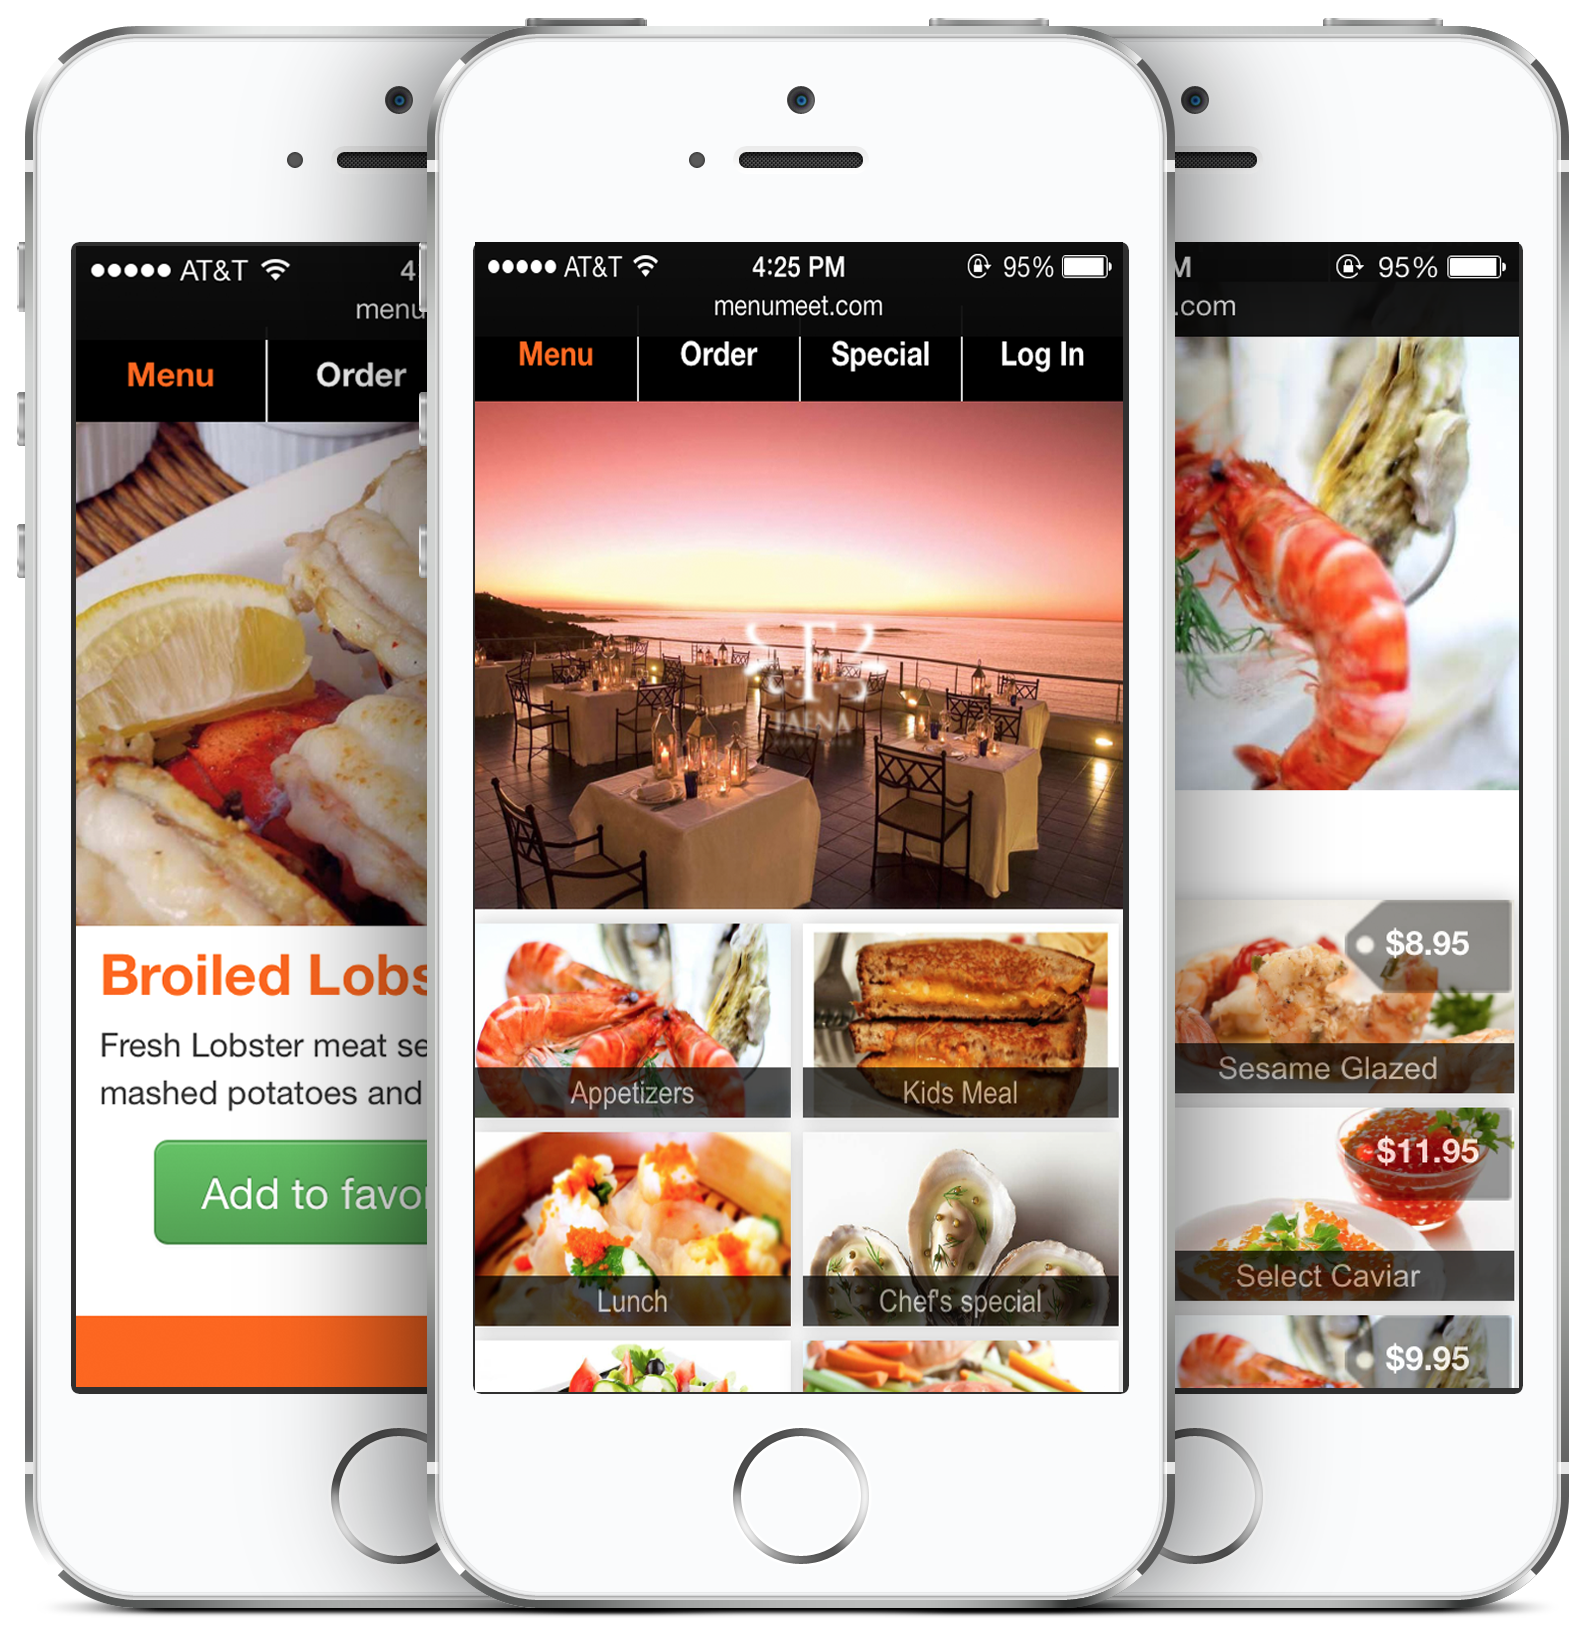 Most beautiful restaurant menu app!